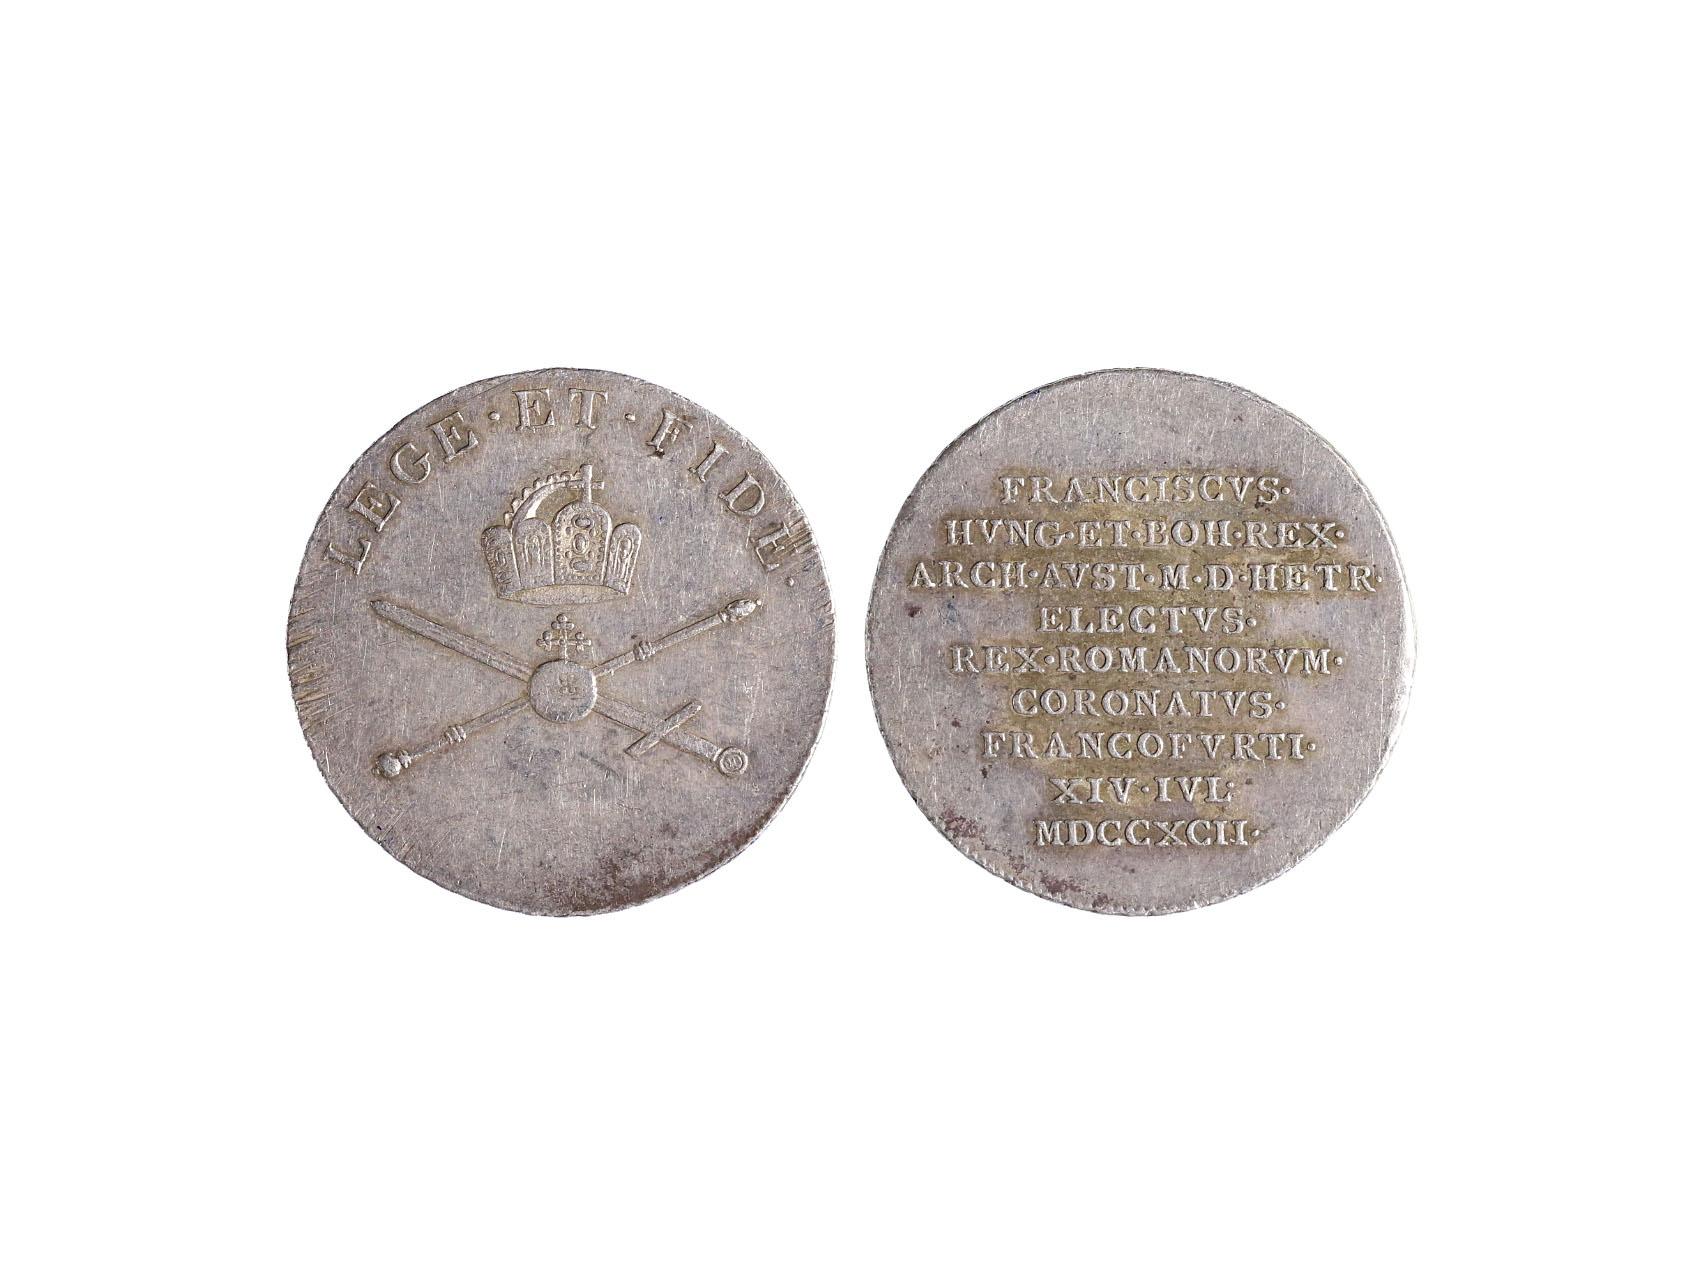 Osobnosti - František I. 1792-1835 - AR žeton 1792 na korunovaci ve Frankfurtu n. M